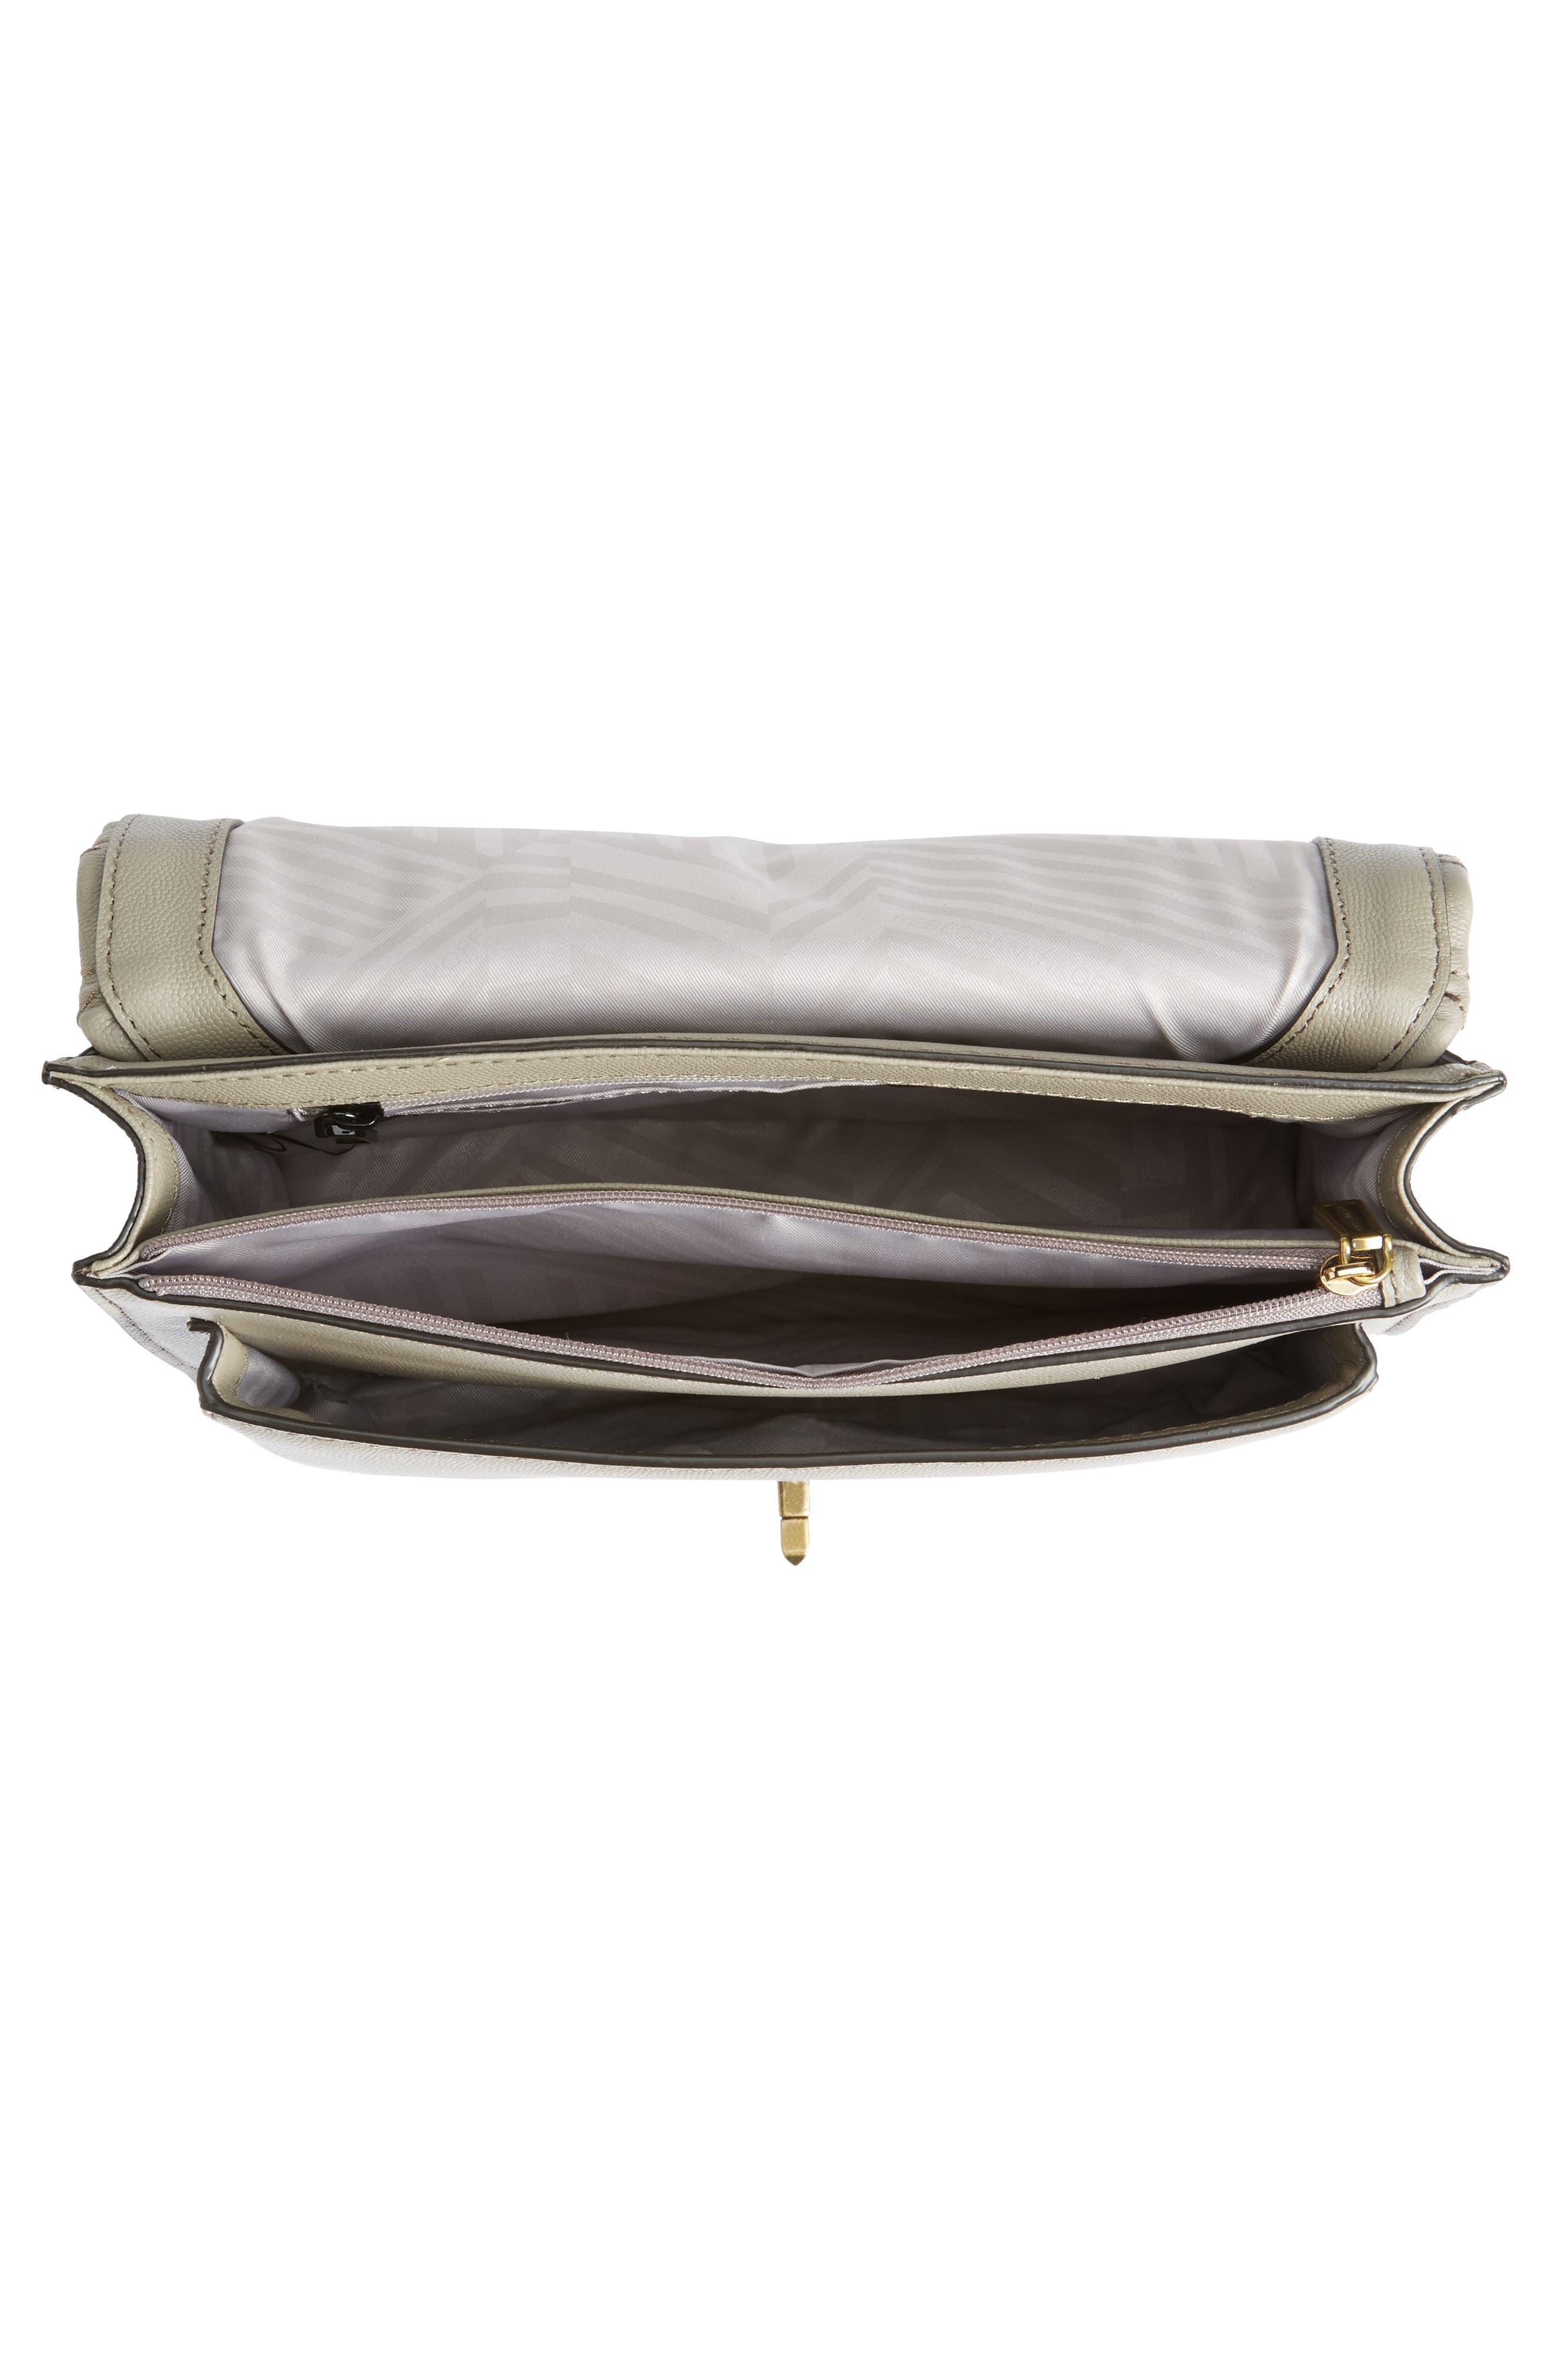 Medium Je T'aime Convertible Leather Crossbody Bag,                             Alternate thumbnail 34, color,